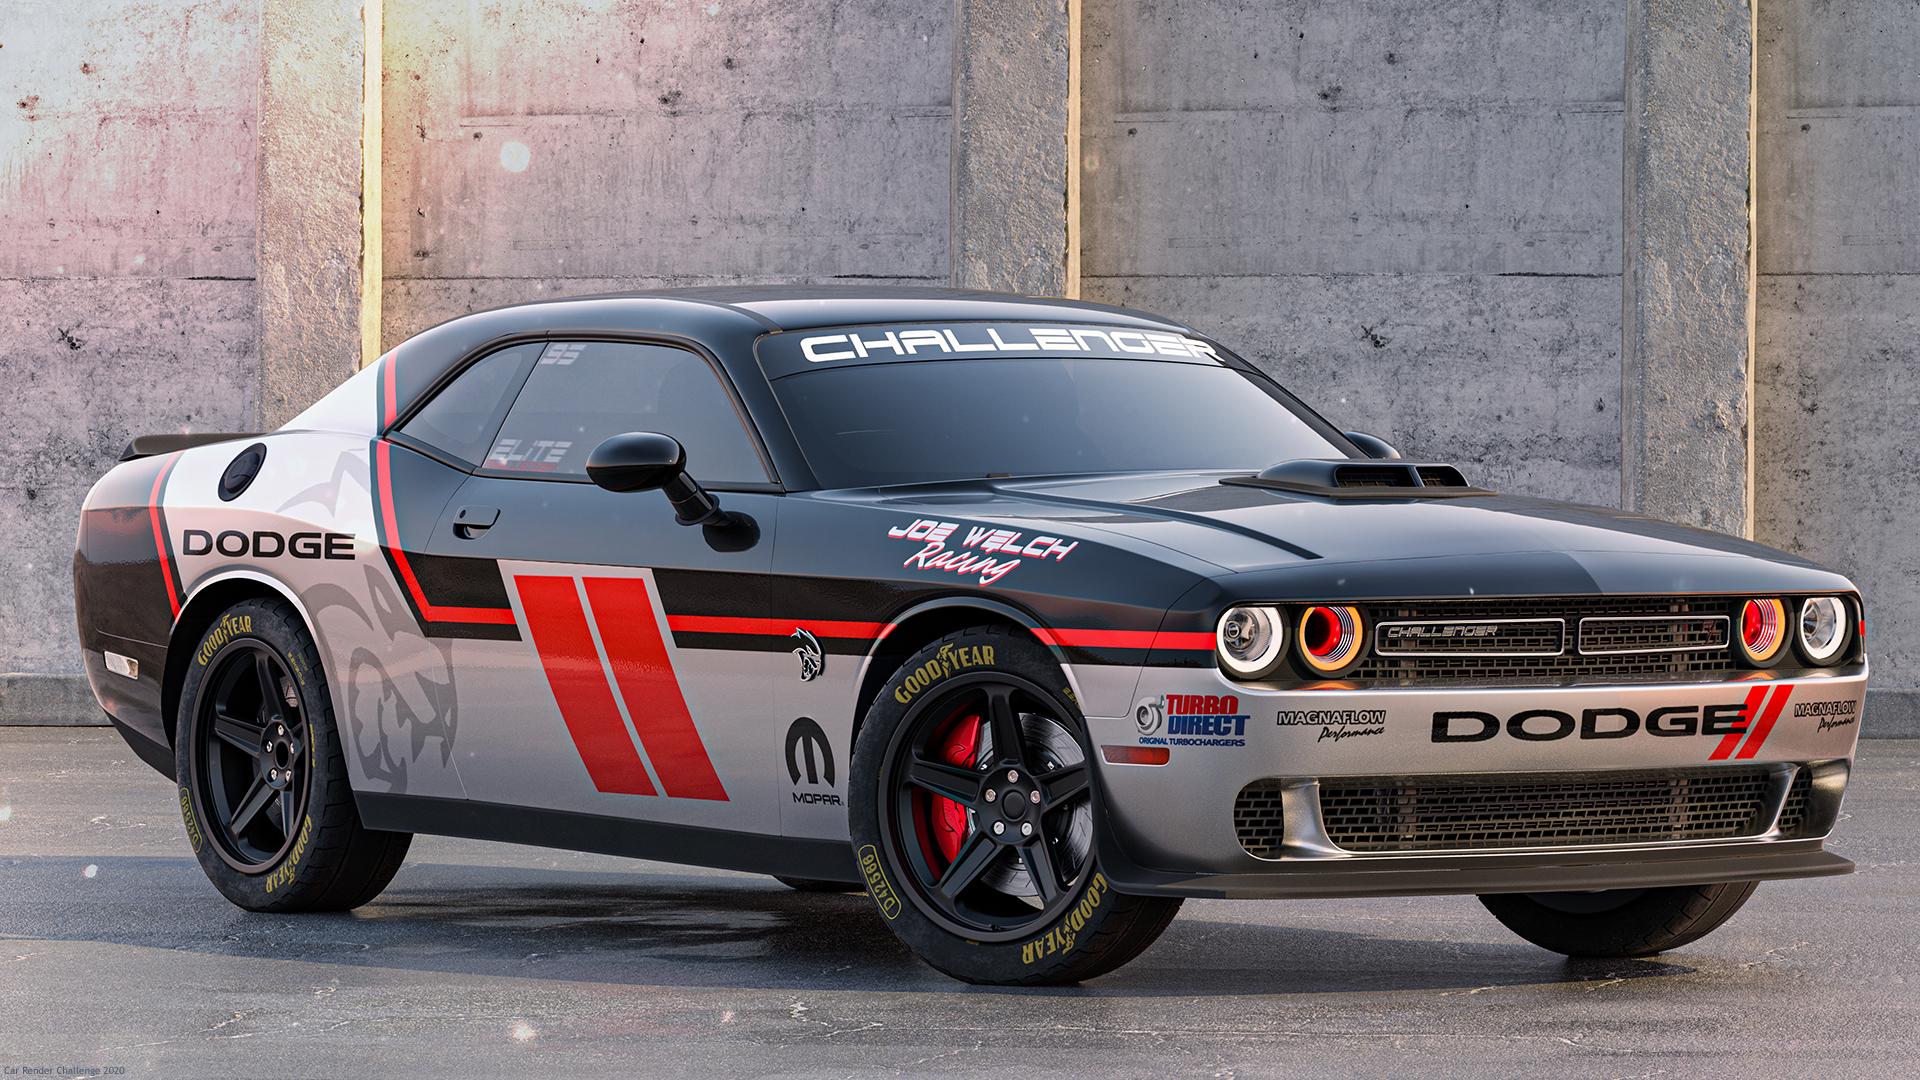 Dodge Challenger by Dachi Gogebashvili